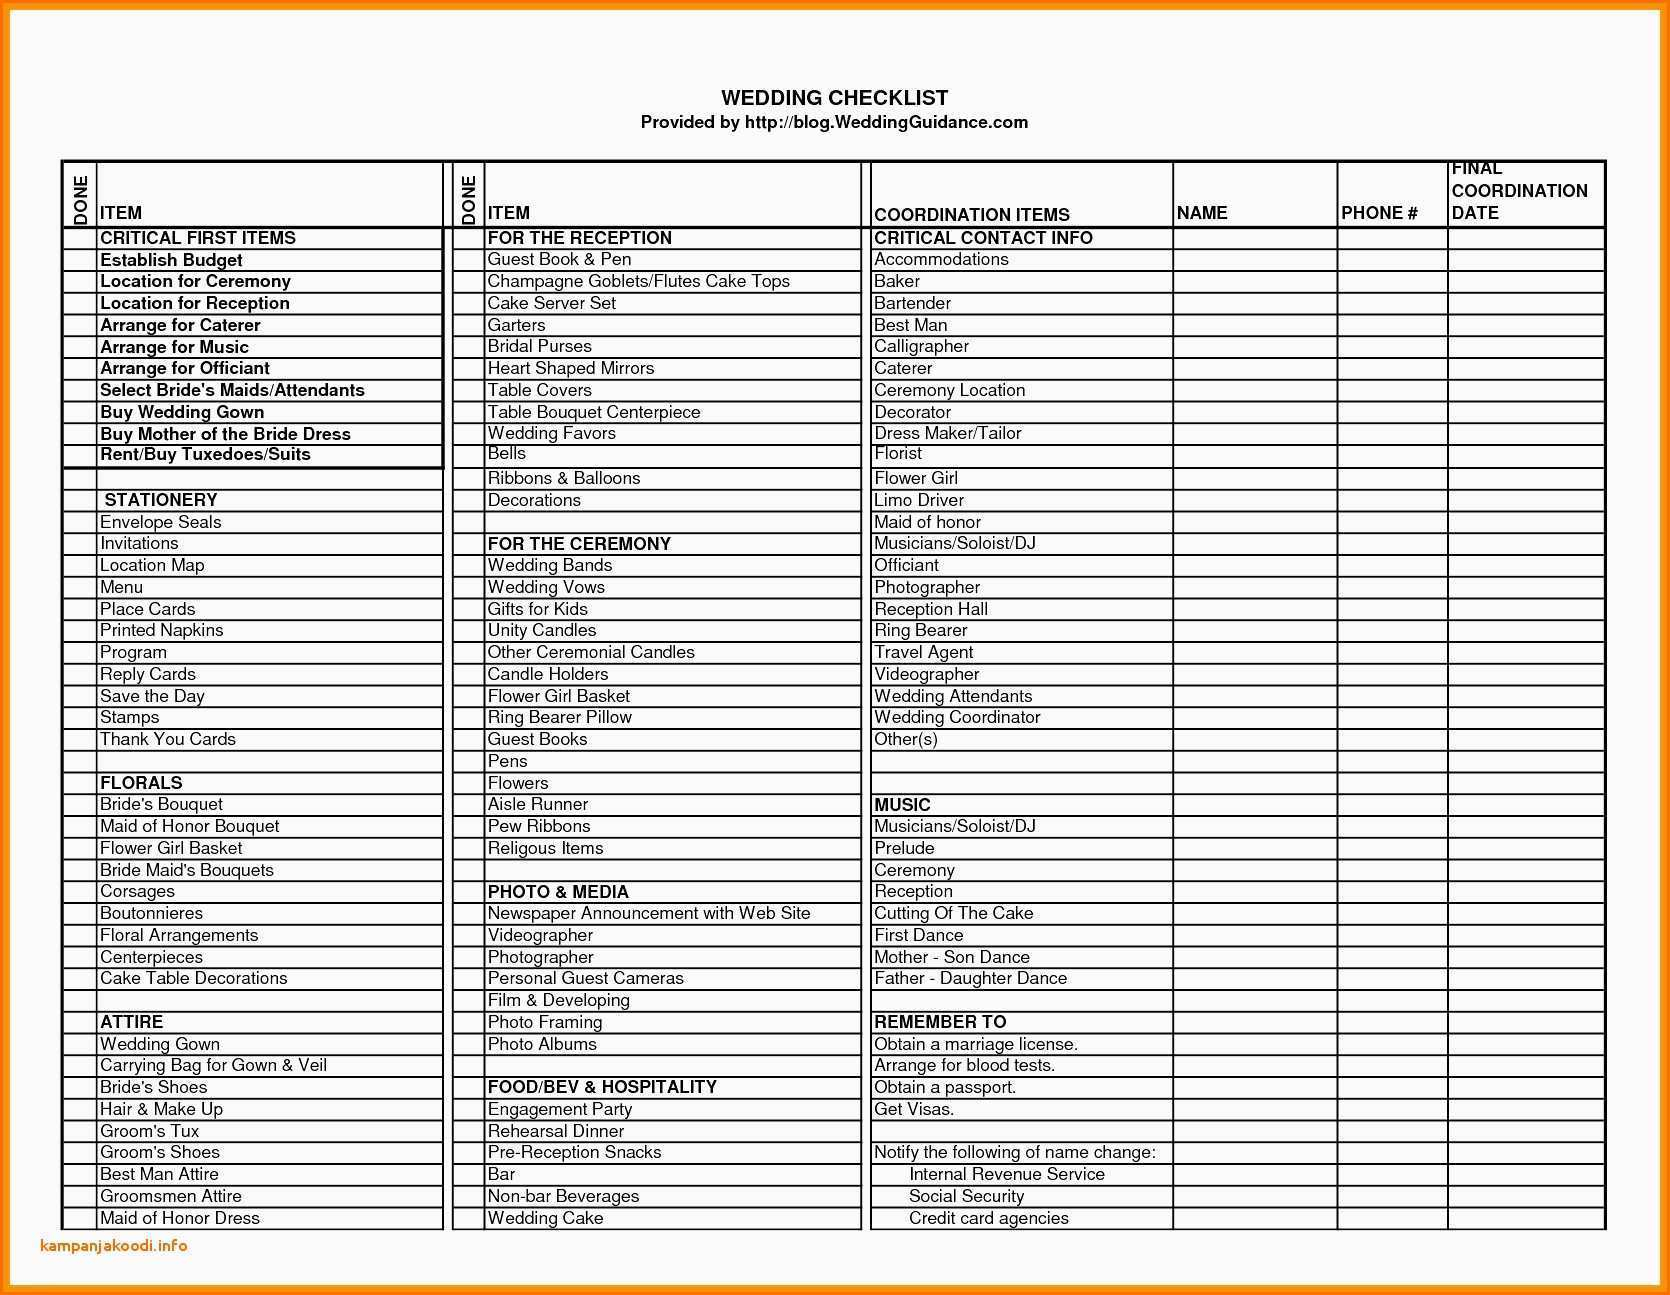 Best Budget Spreadsheet With Regard To Wedding Budget